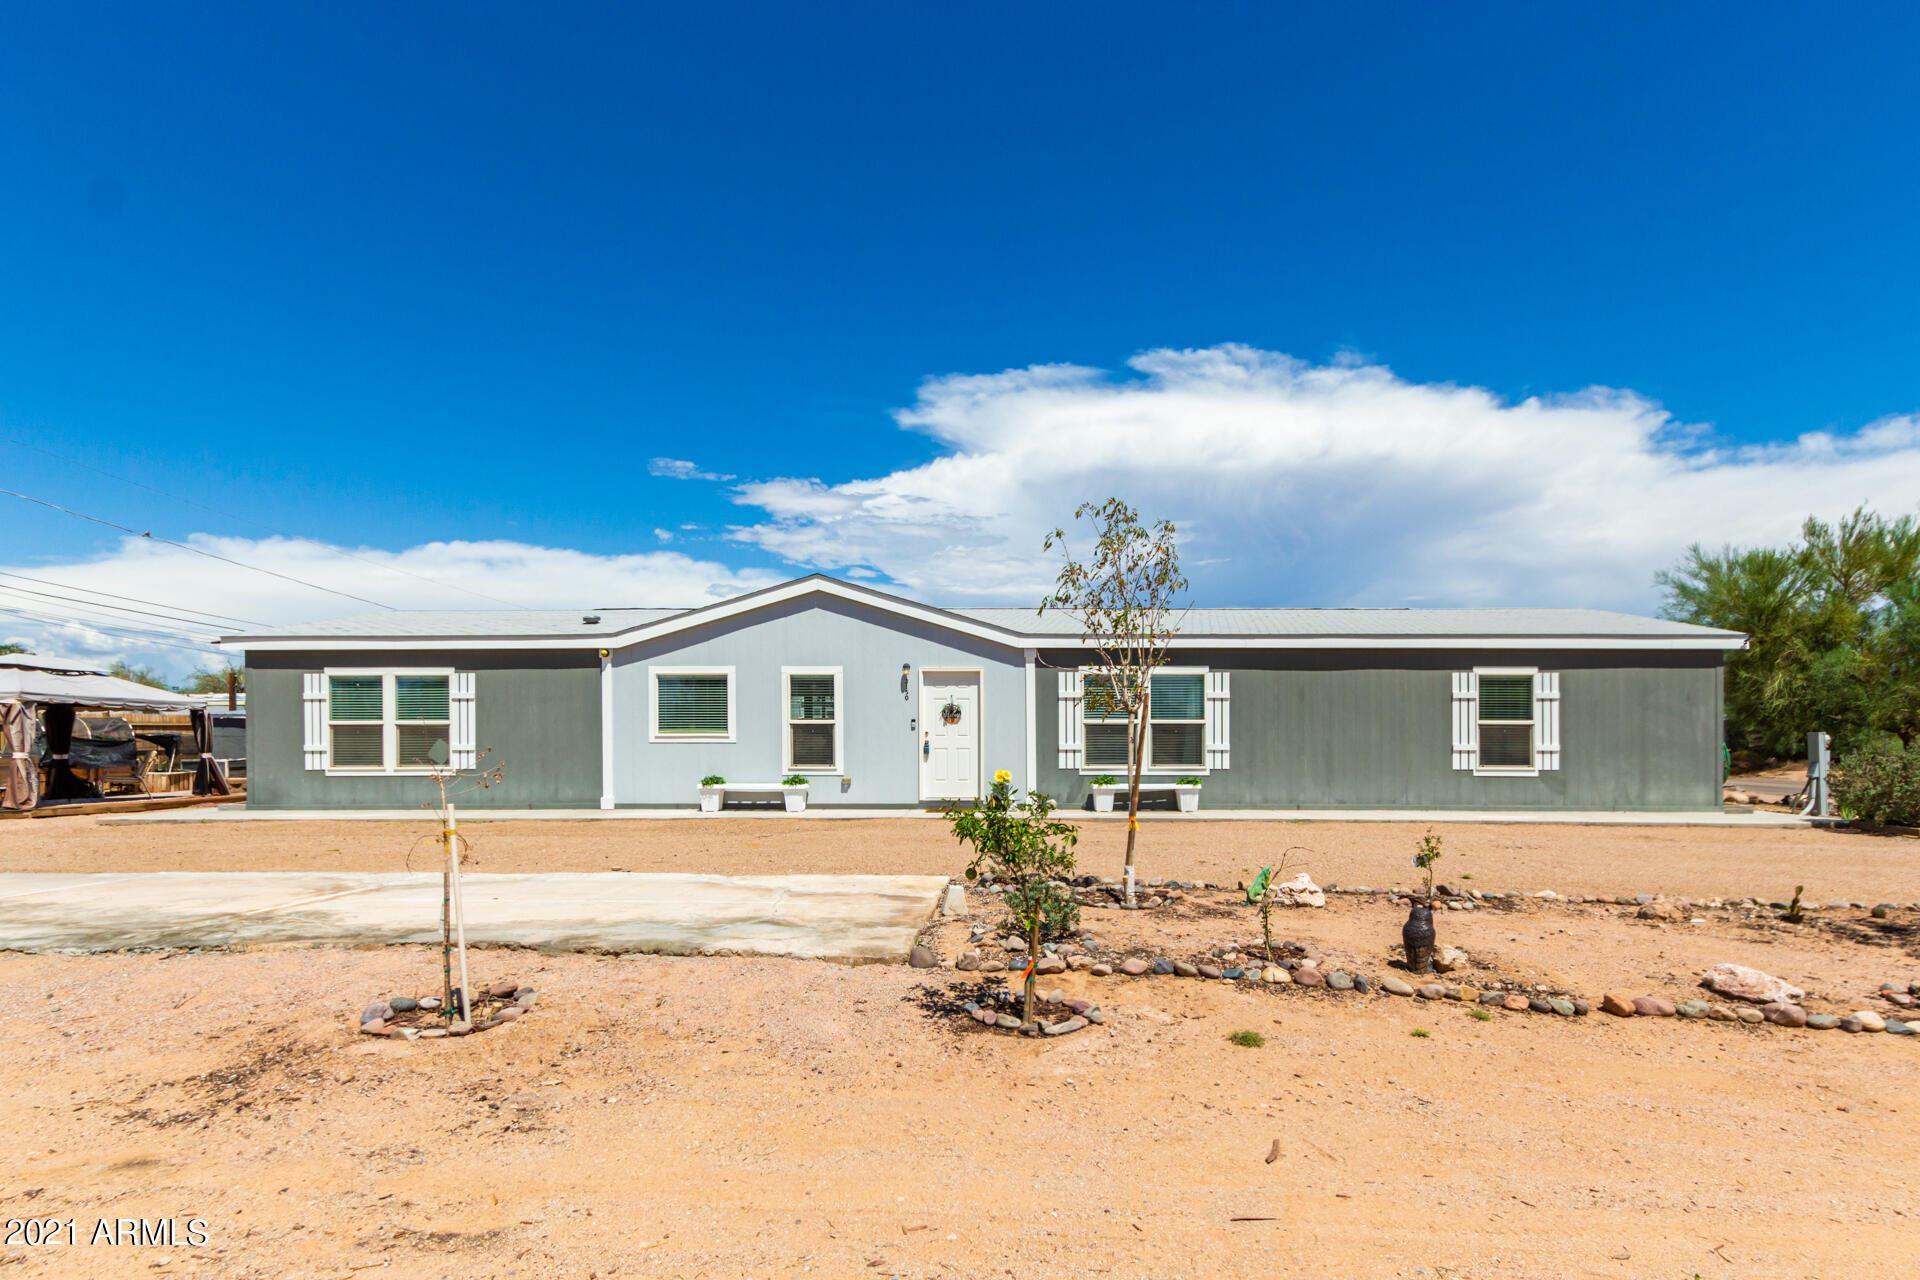 3150 W ROUNDUP Street, Apache Junction, AZ 85120 - #: 6272219